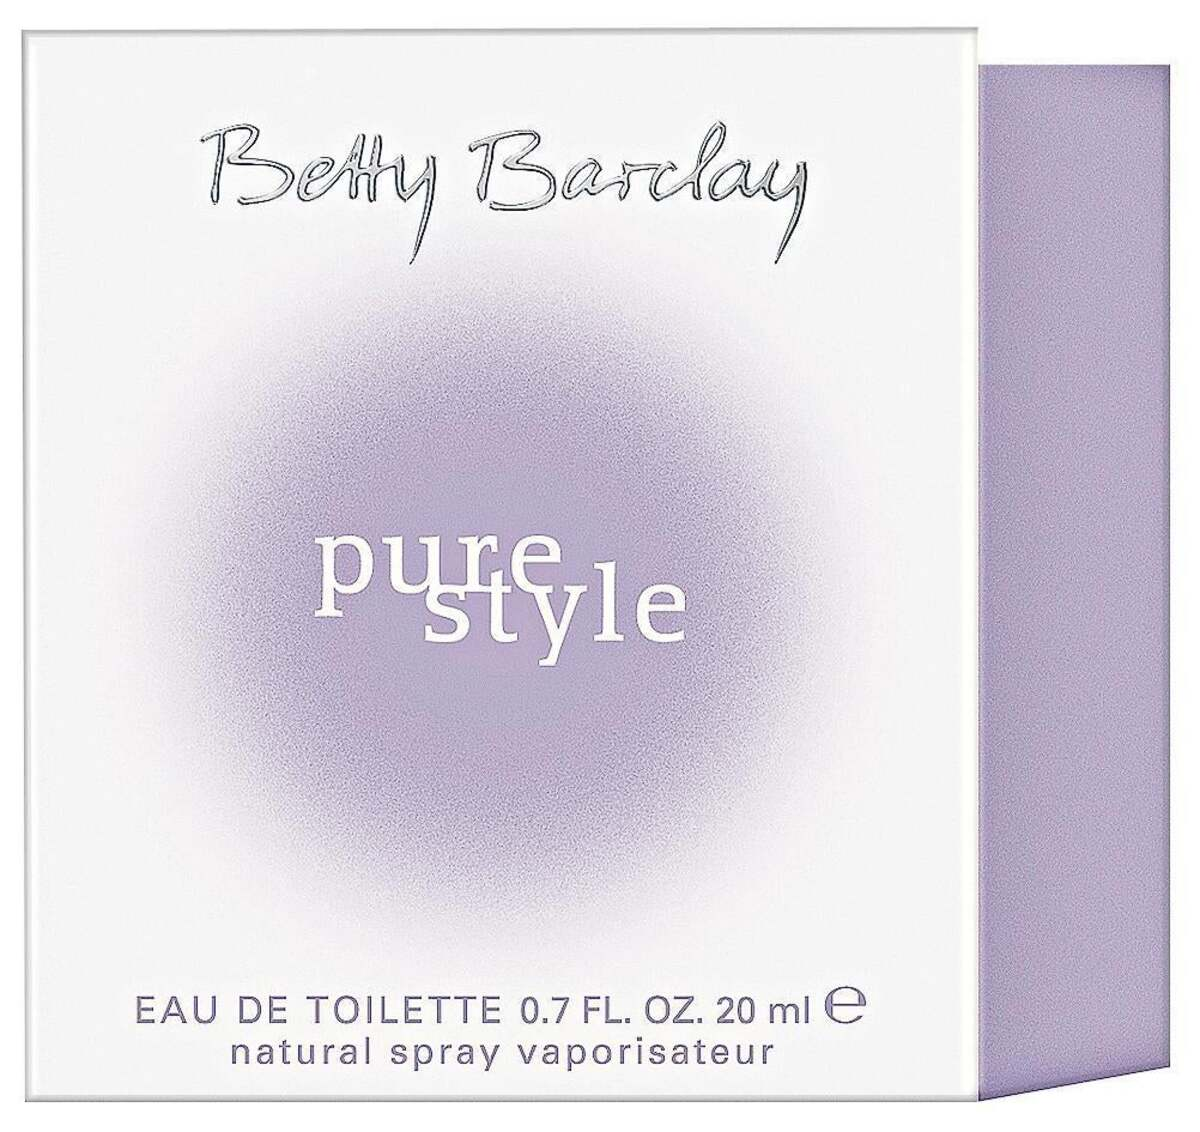 Bild 2 von Betty Barclay pure style              Eau de Toilette